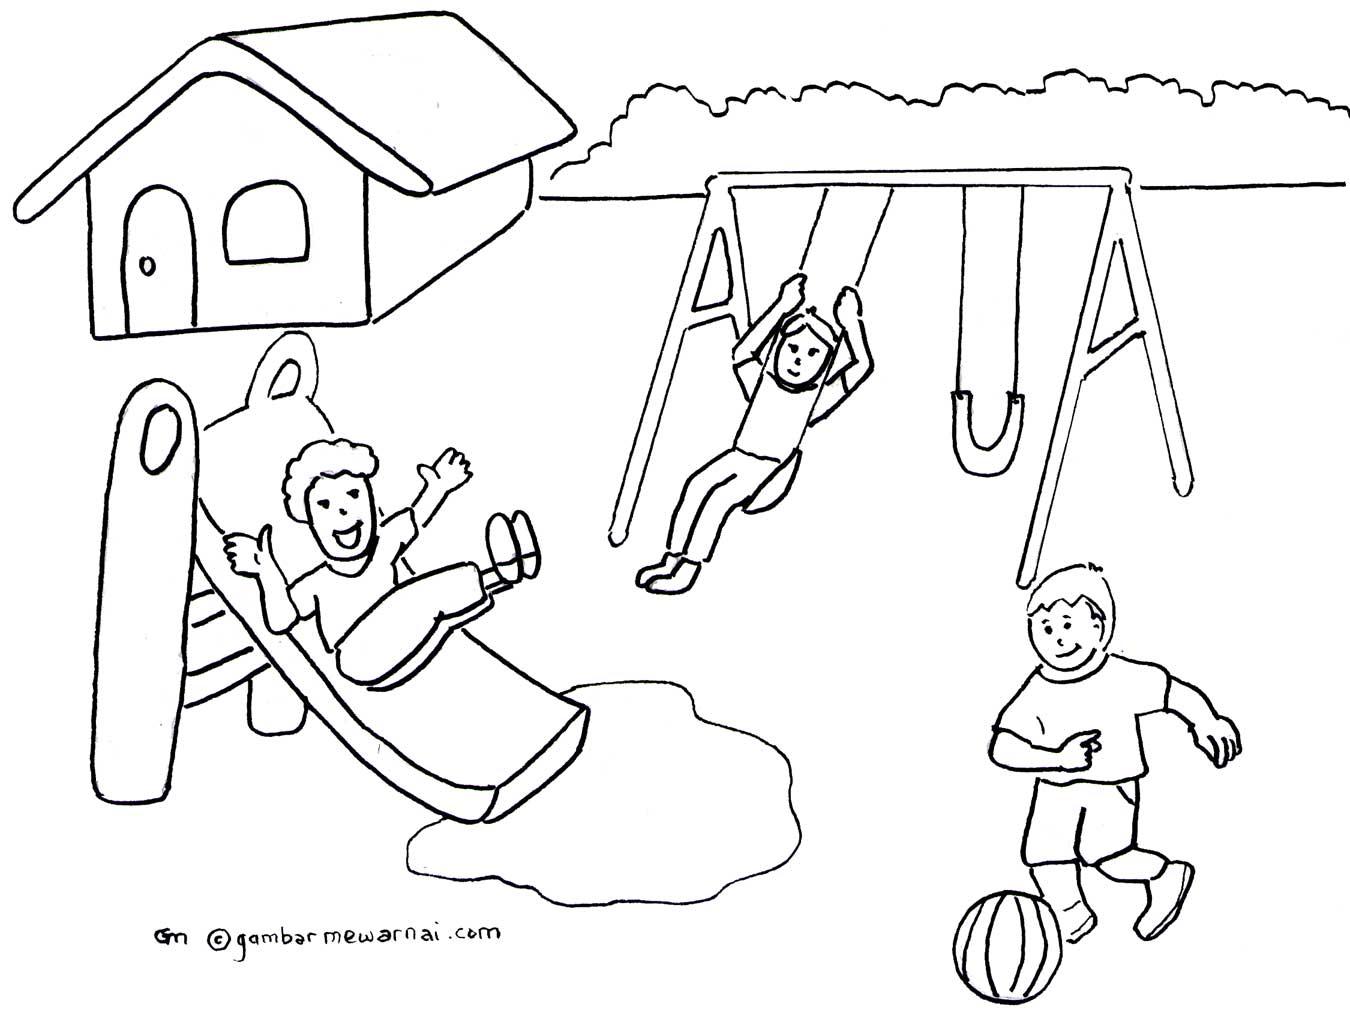 Kartun Hello Kitty Gambar Sketsa Untuk Diwarnai Anak